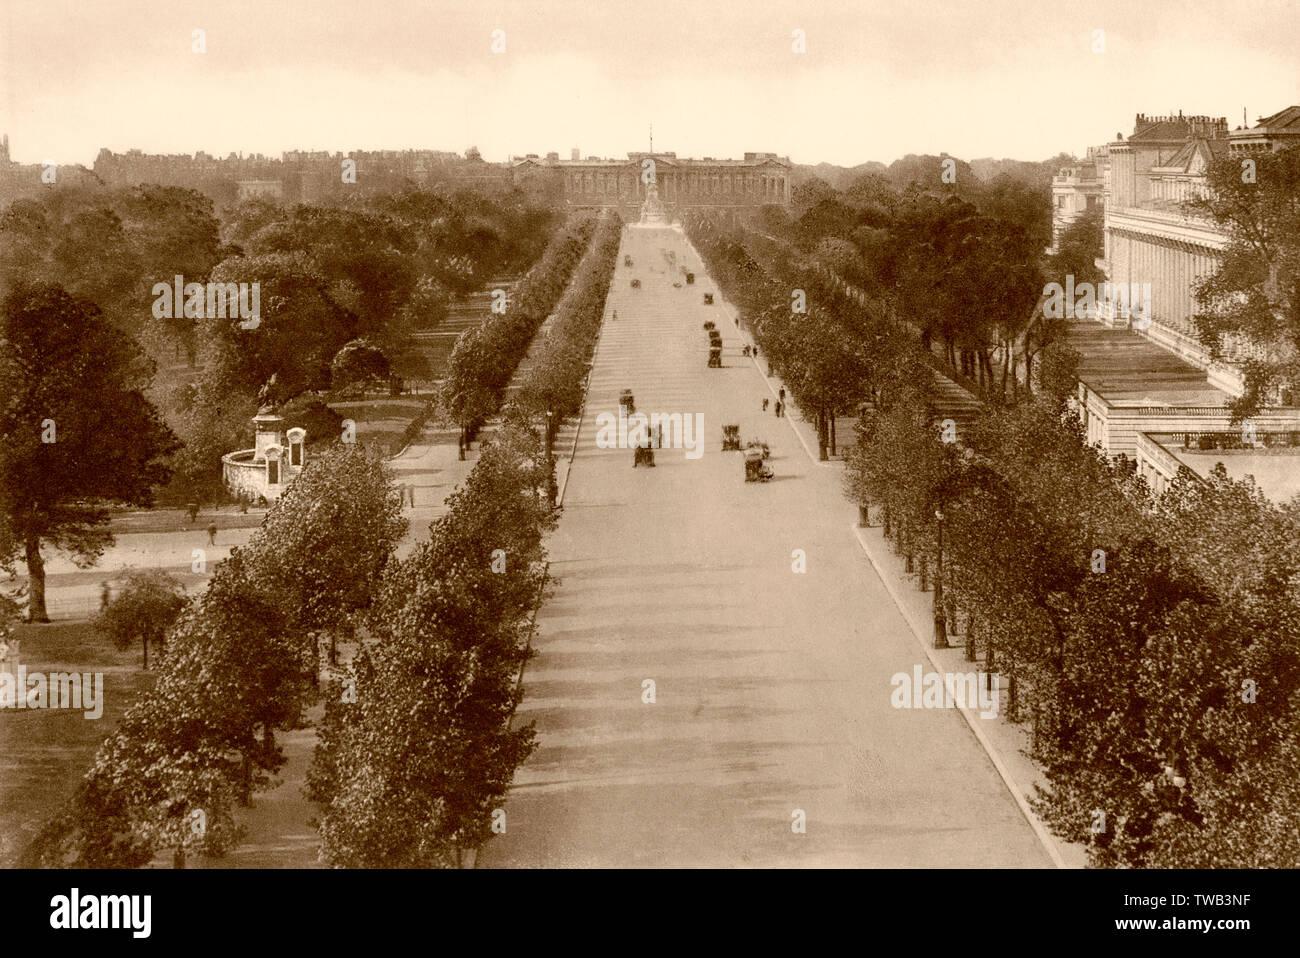 The Mall, London, UK, ca 1920 - Stock Image